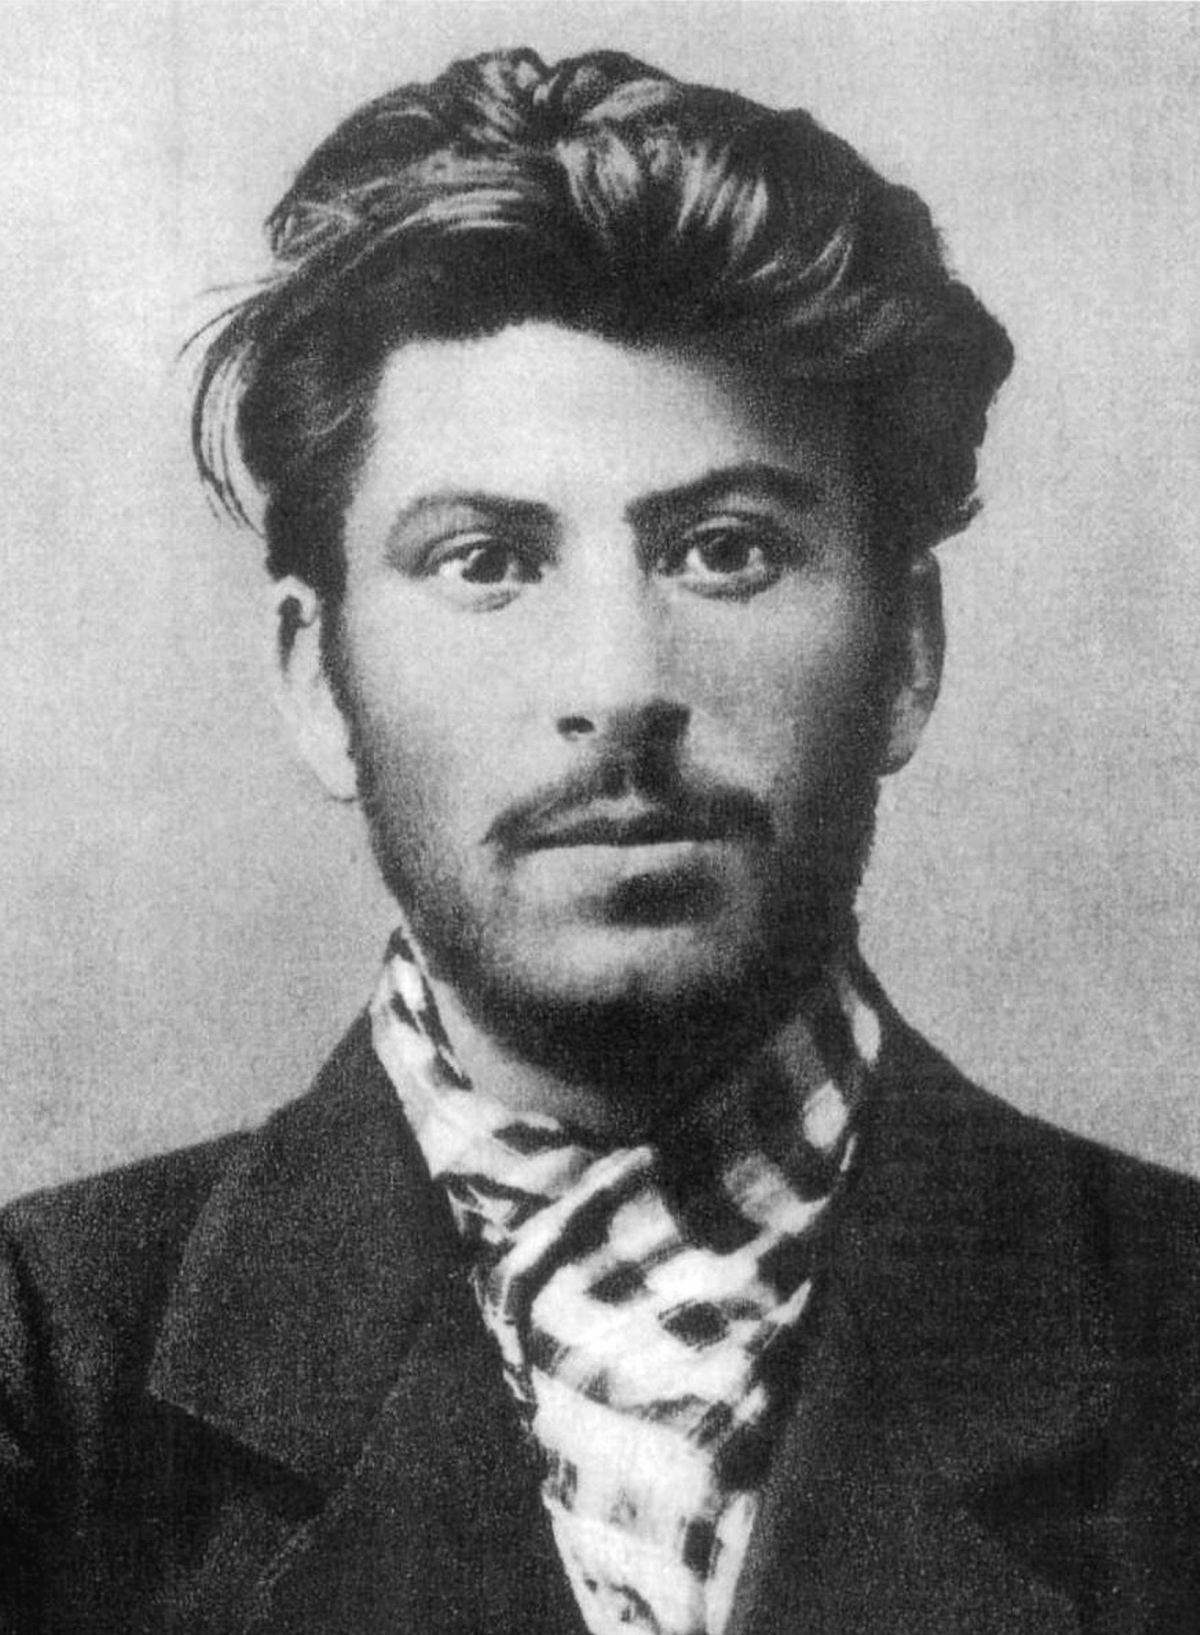 Stalin rannie foto 1